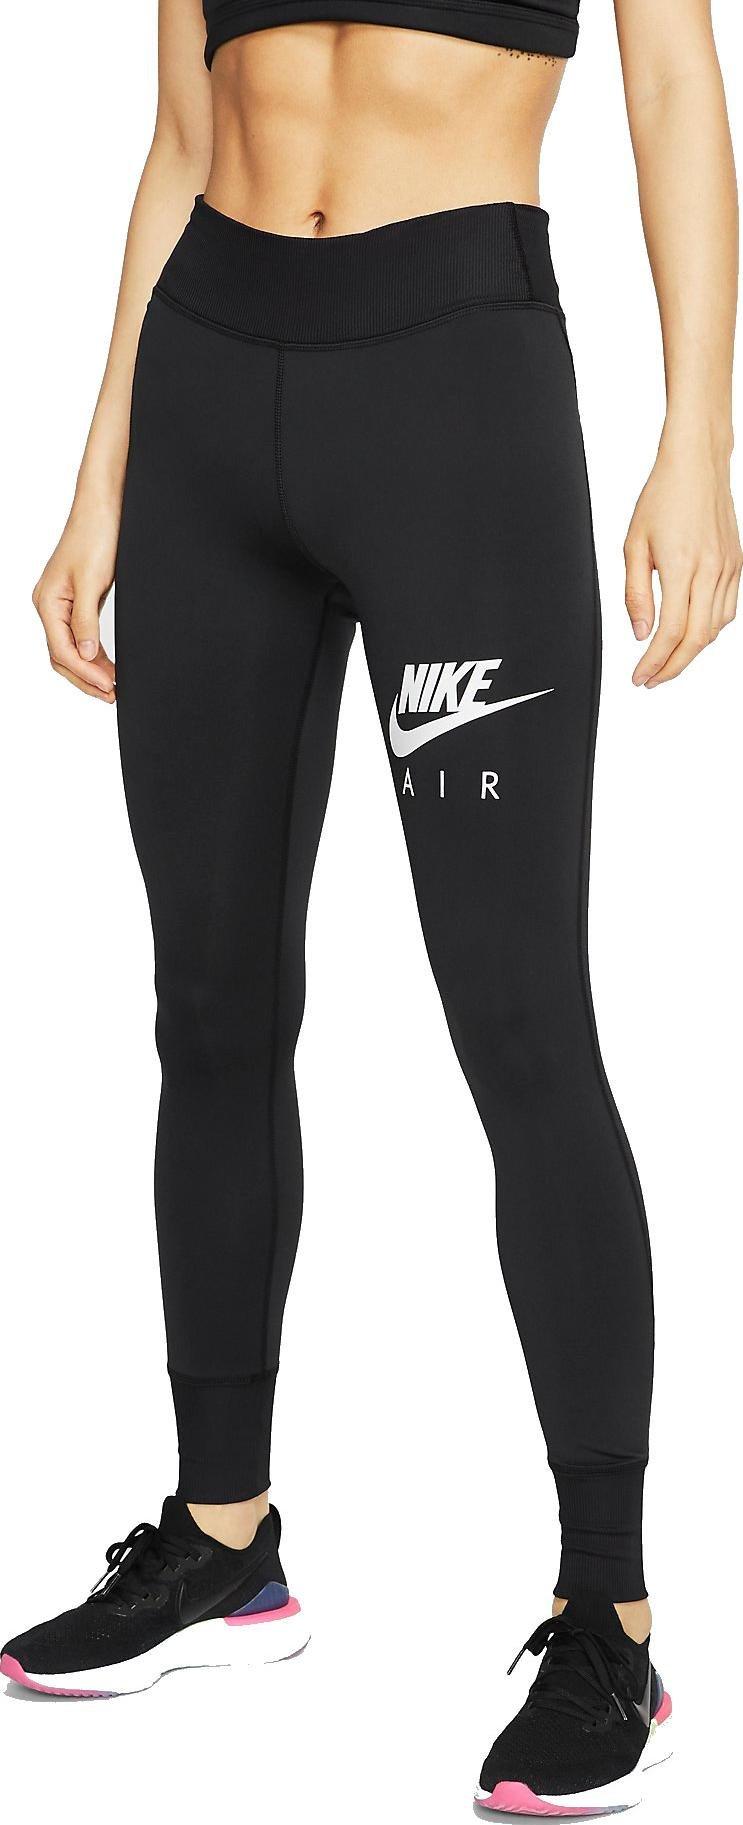 Dámské 7/8 legíny Nike Fast Air Graphic